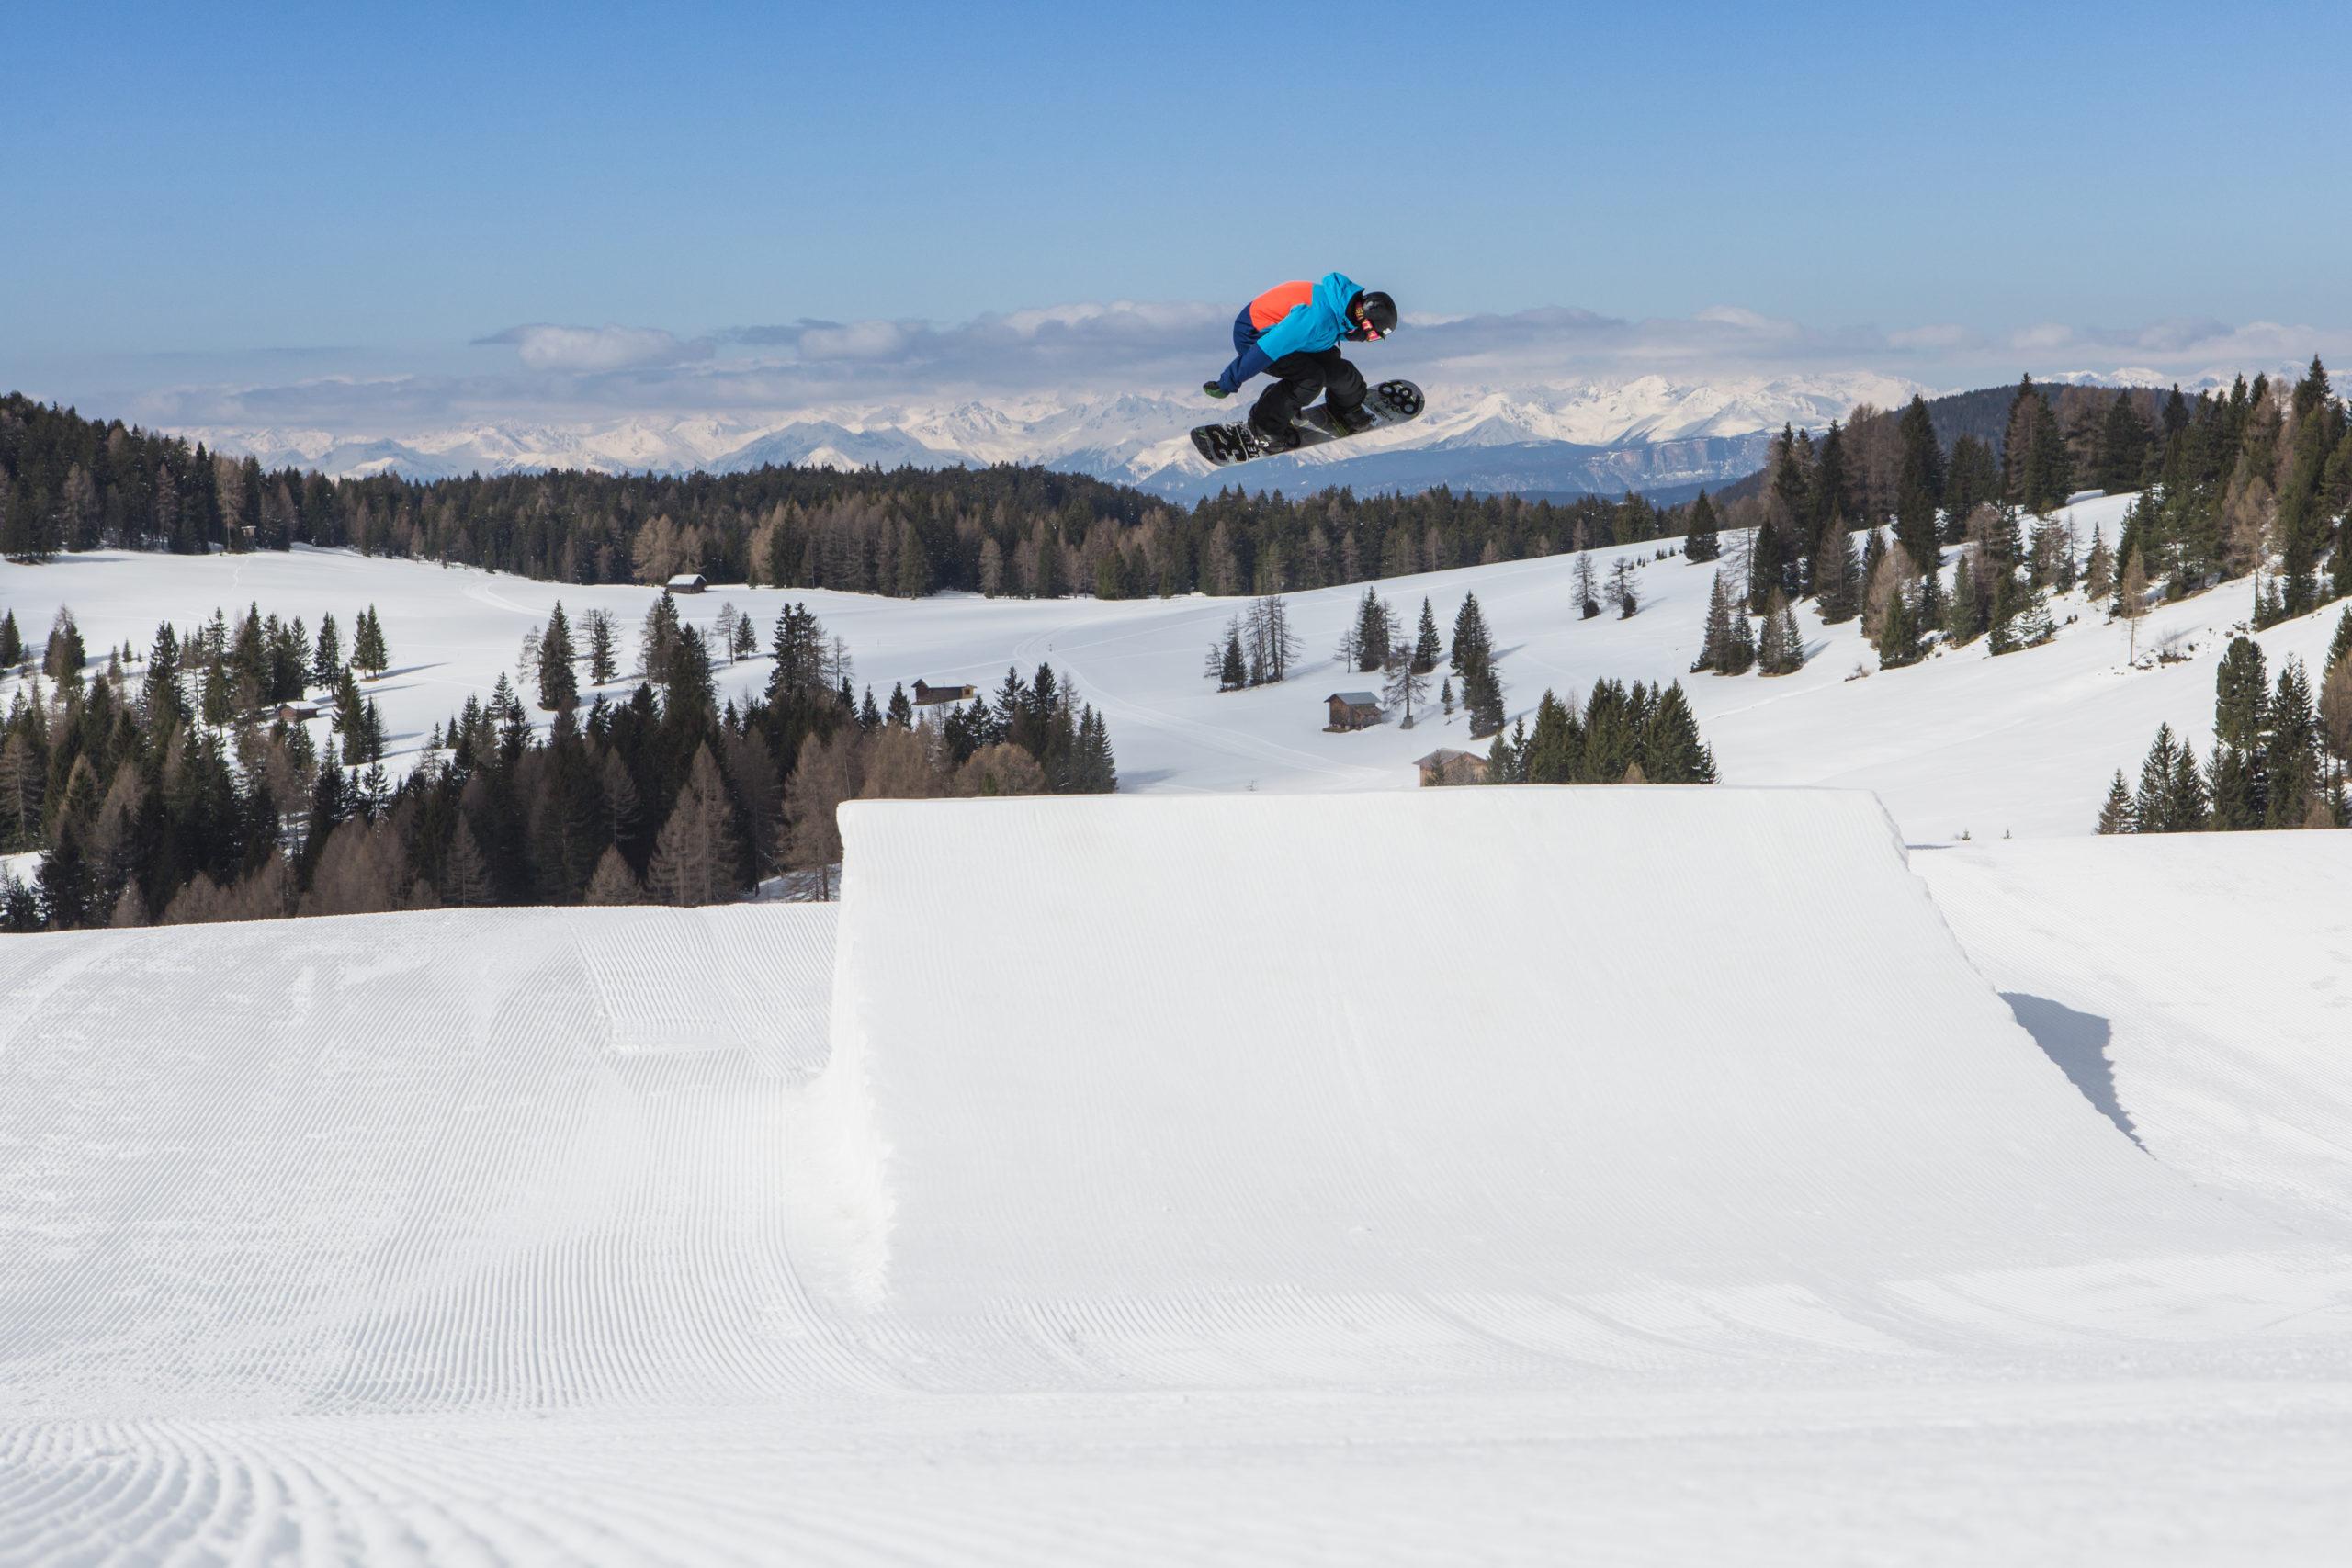 Snowpark-Carezza-Snowboarder-High-Jump-3